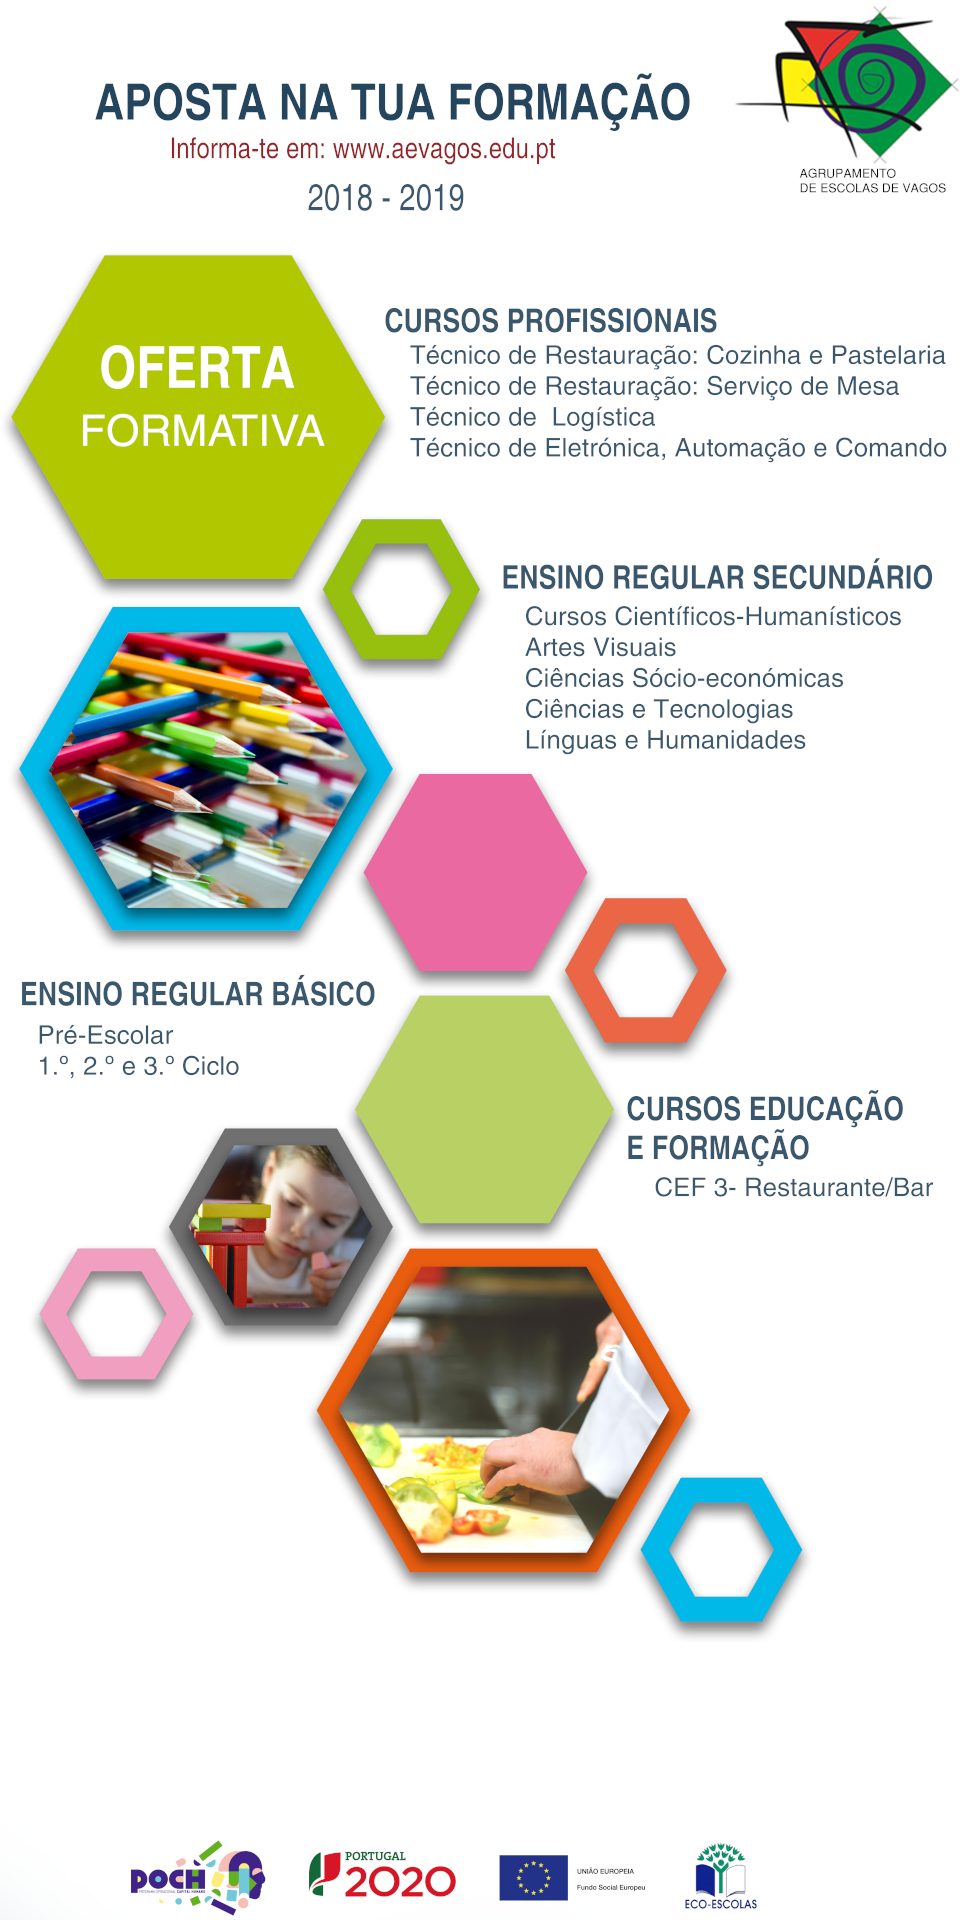 Oferta Formativa 2018 2019